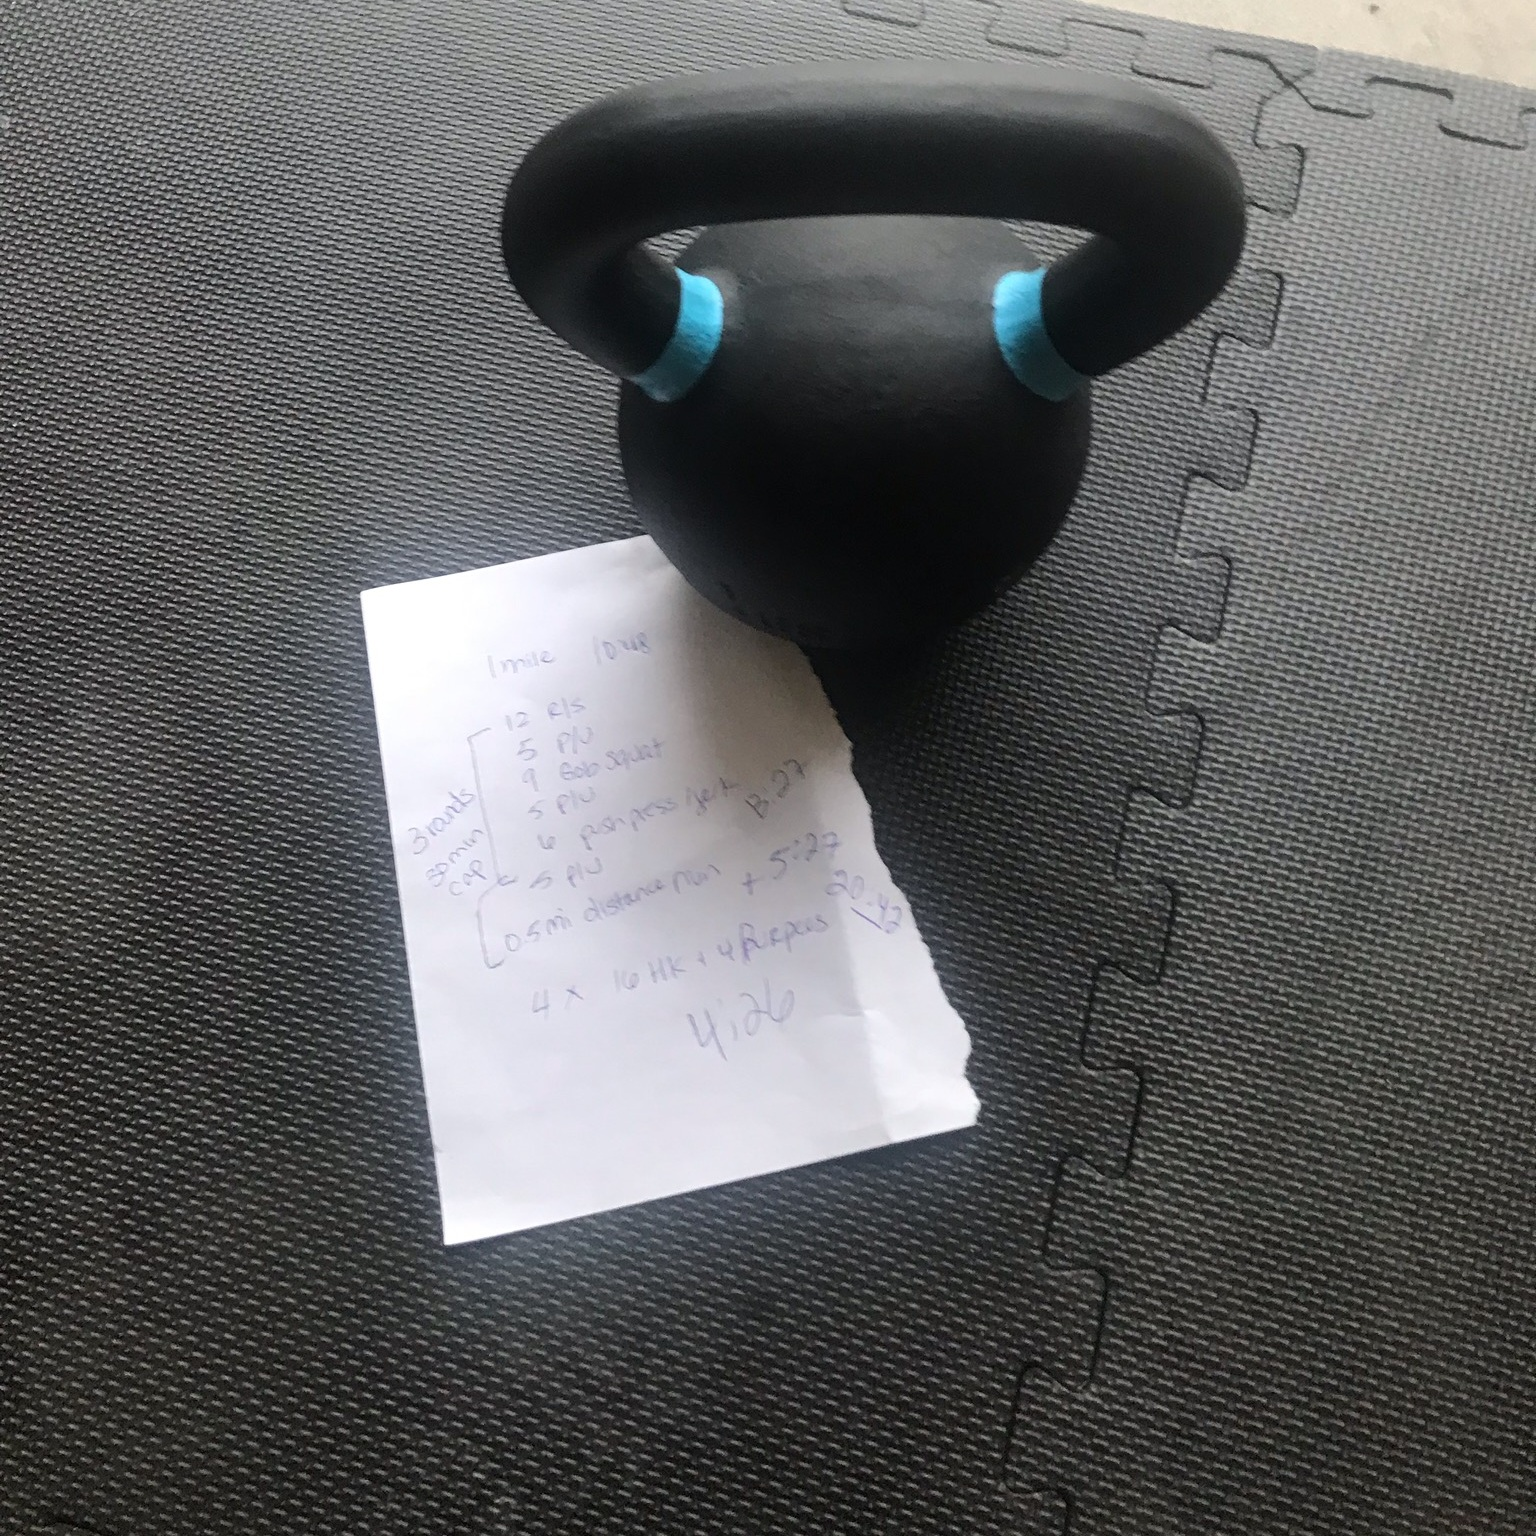 Sunda home gym workout notes